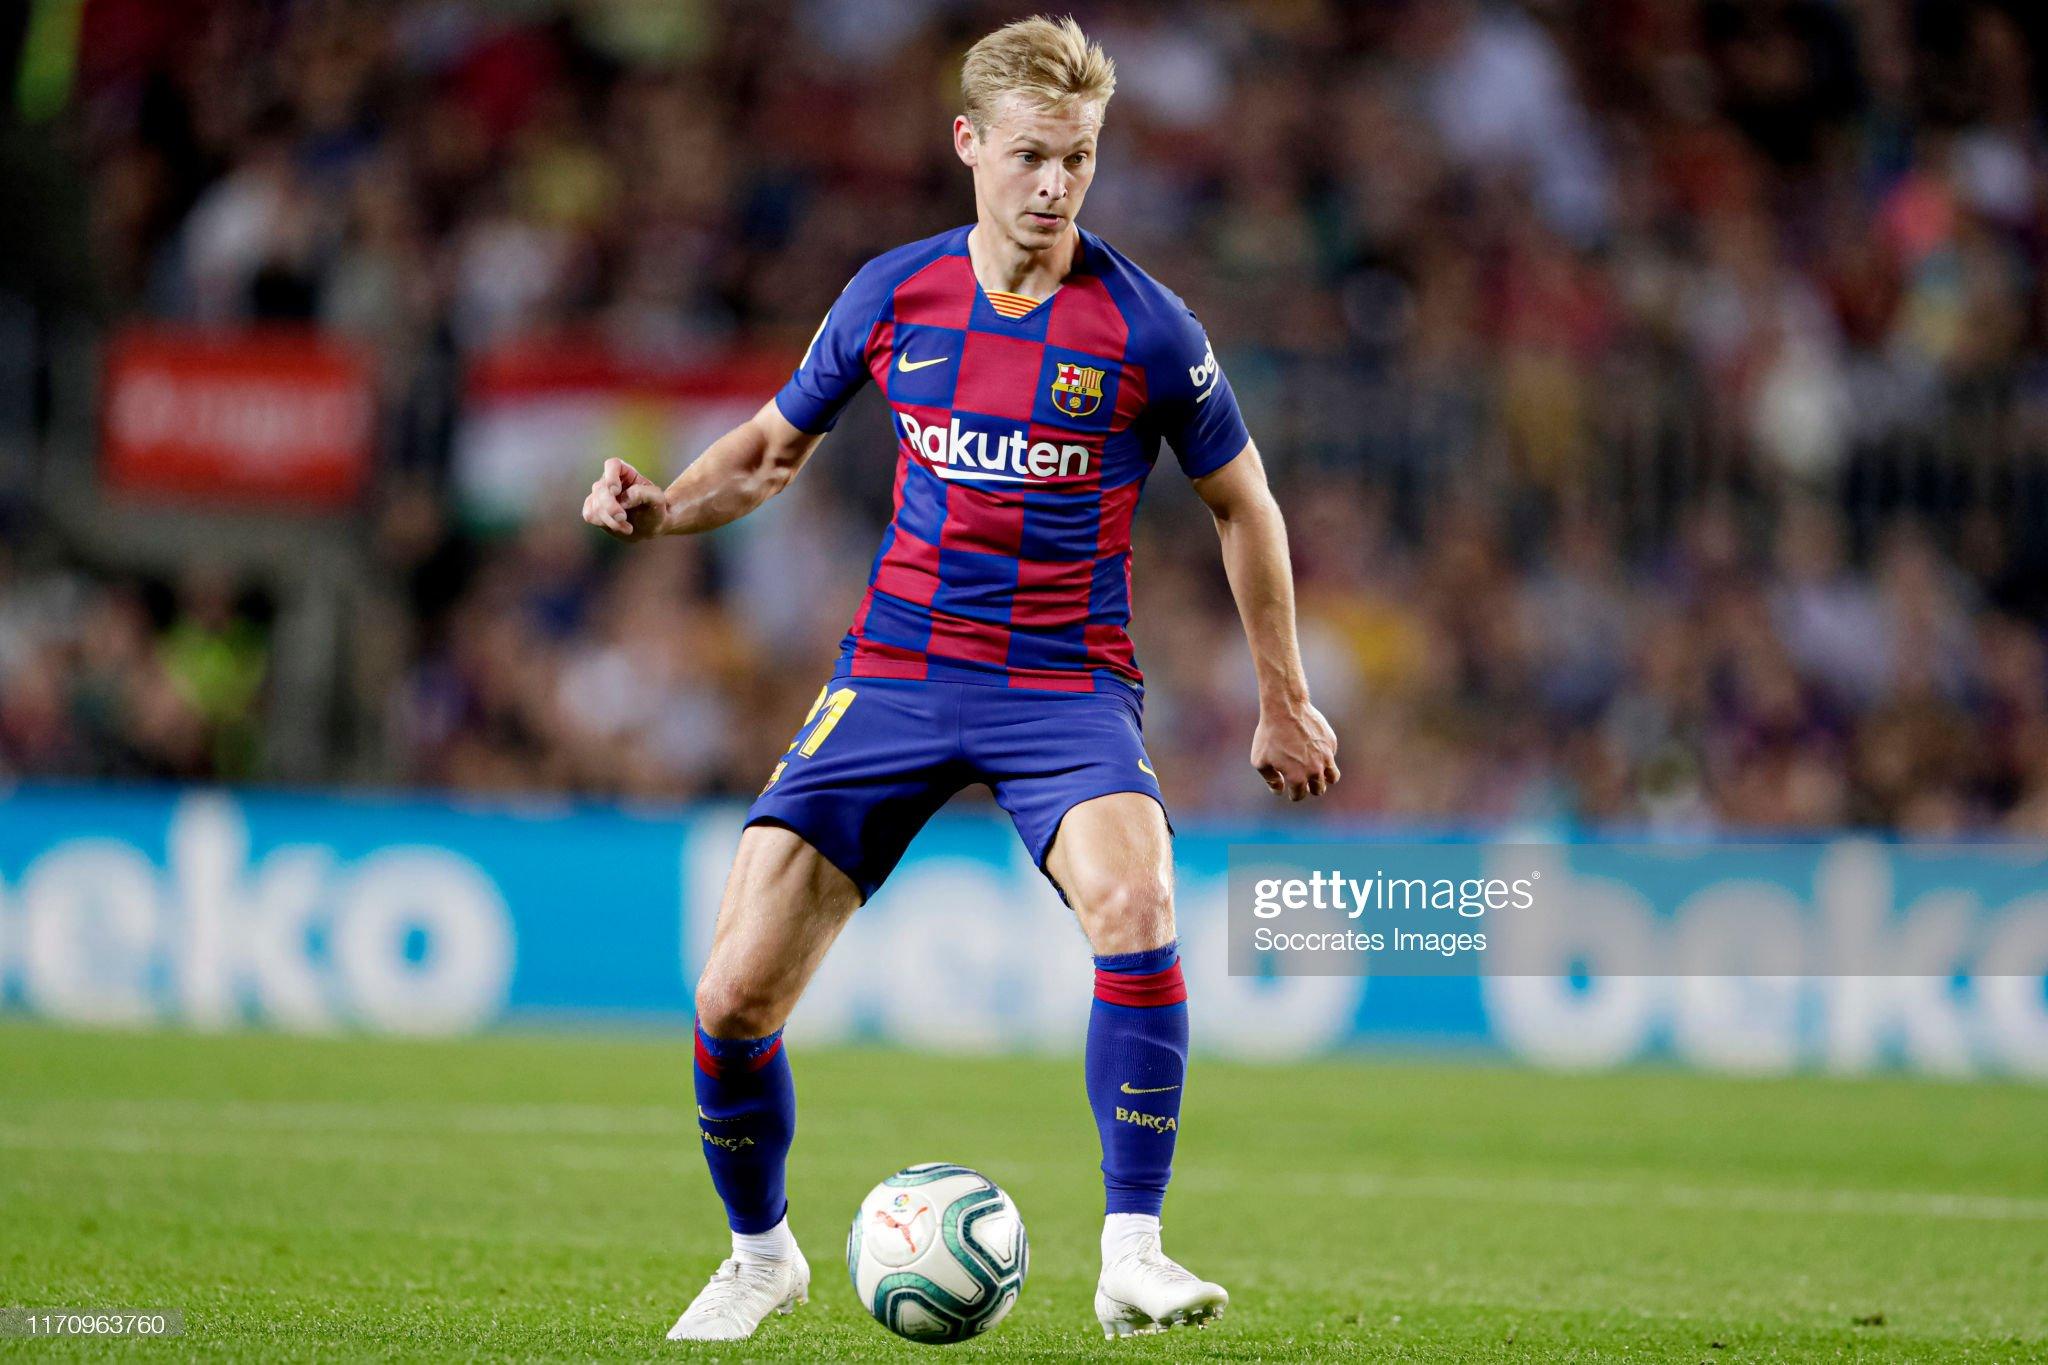 صور مباراة : برشلونة - فياريال 2-1 ( 24-09-2019 )  Frenkie-de-jong-of-fc-barcelona-during-the-la-liga-santander-match-picture-id1170963760?s=2048x2048